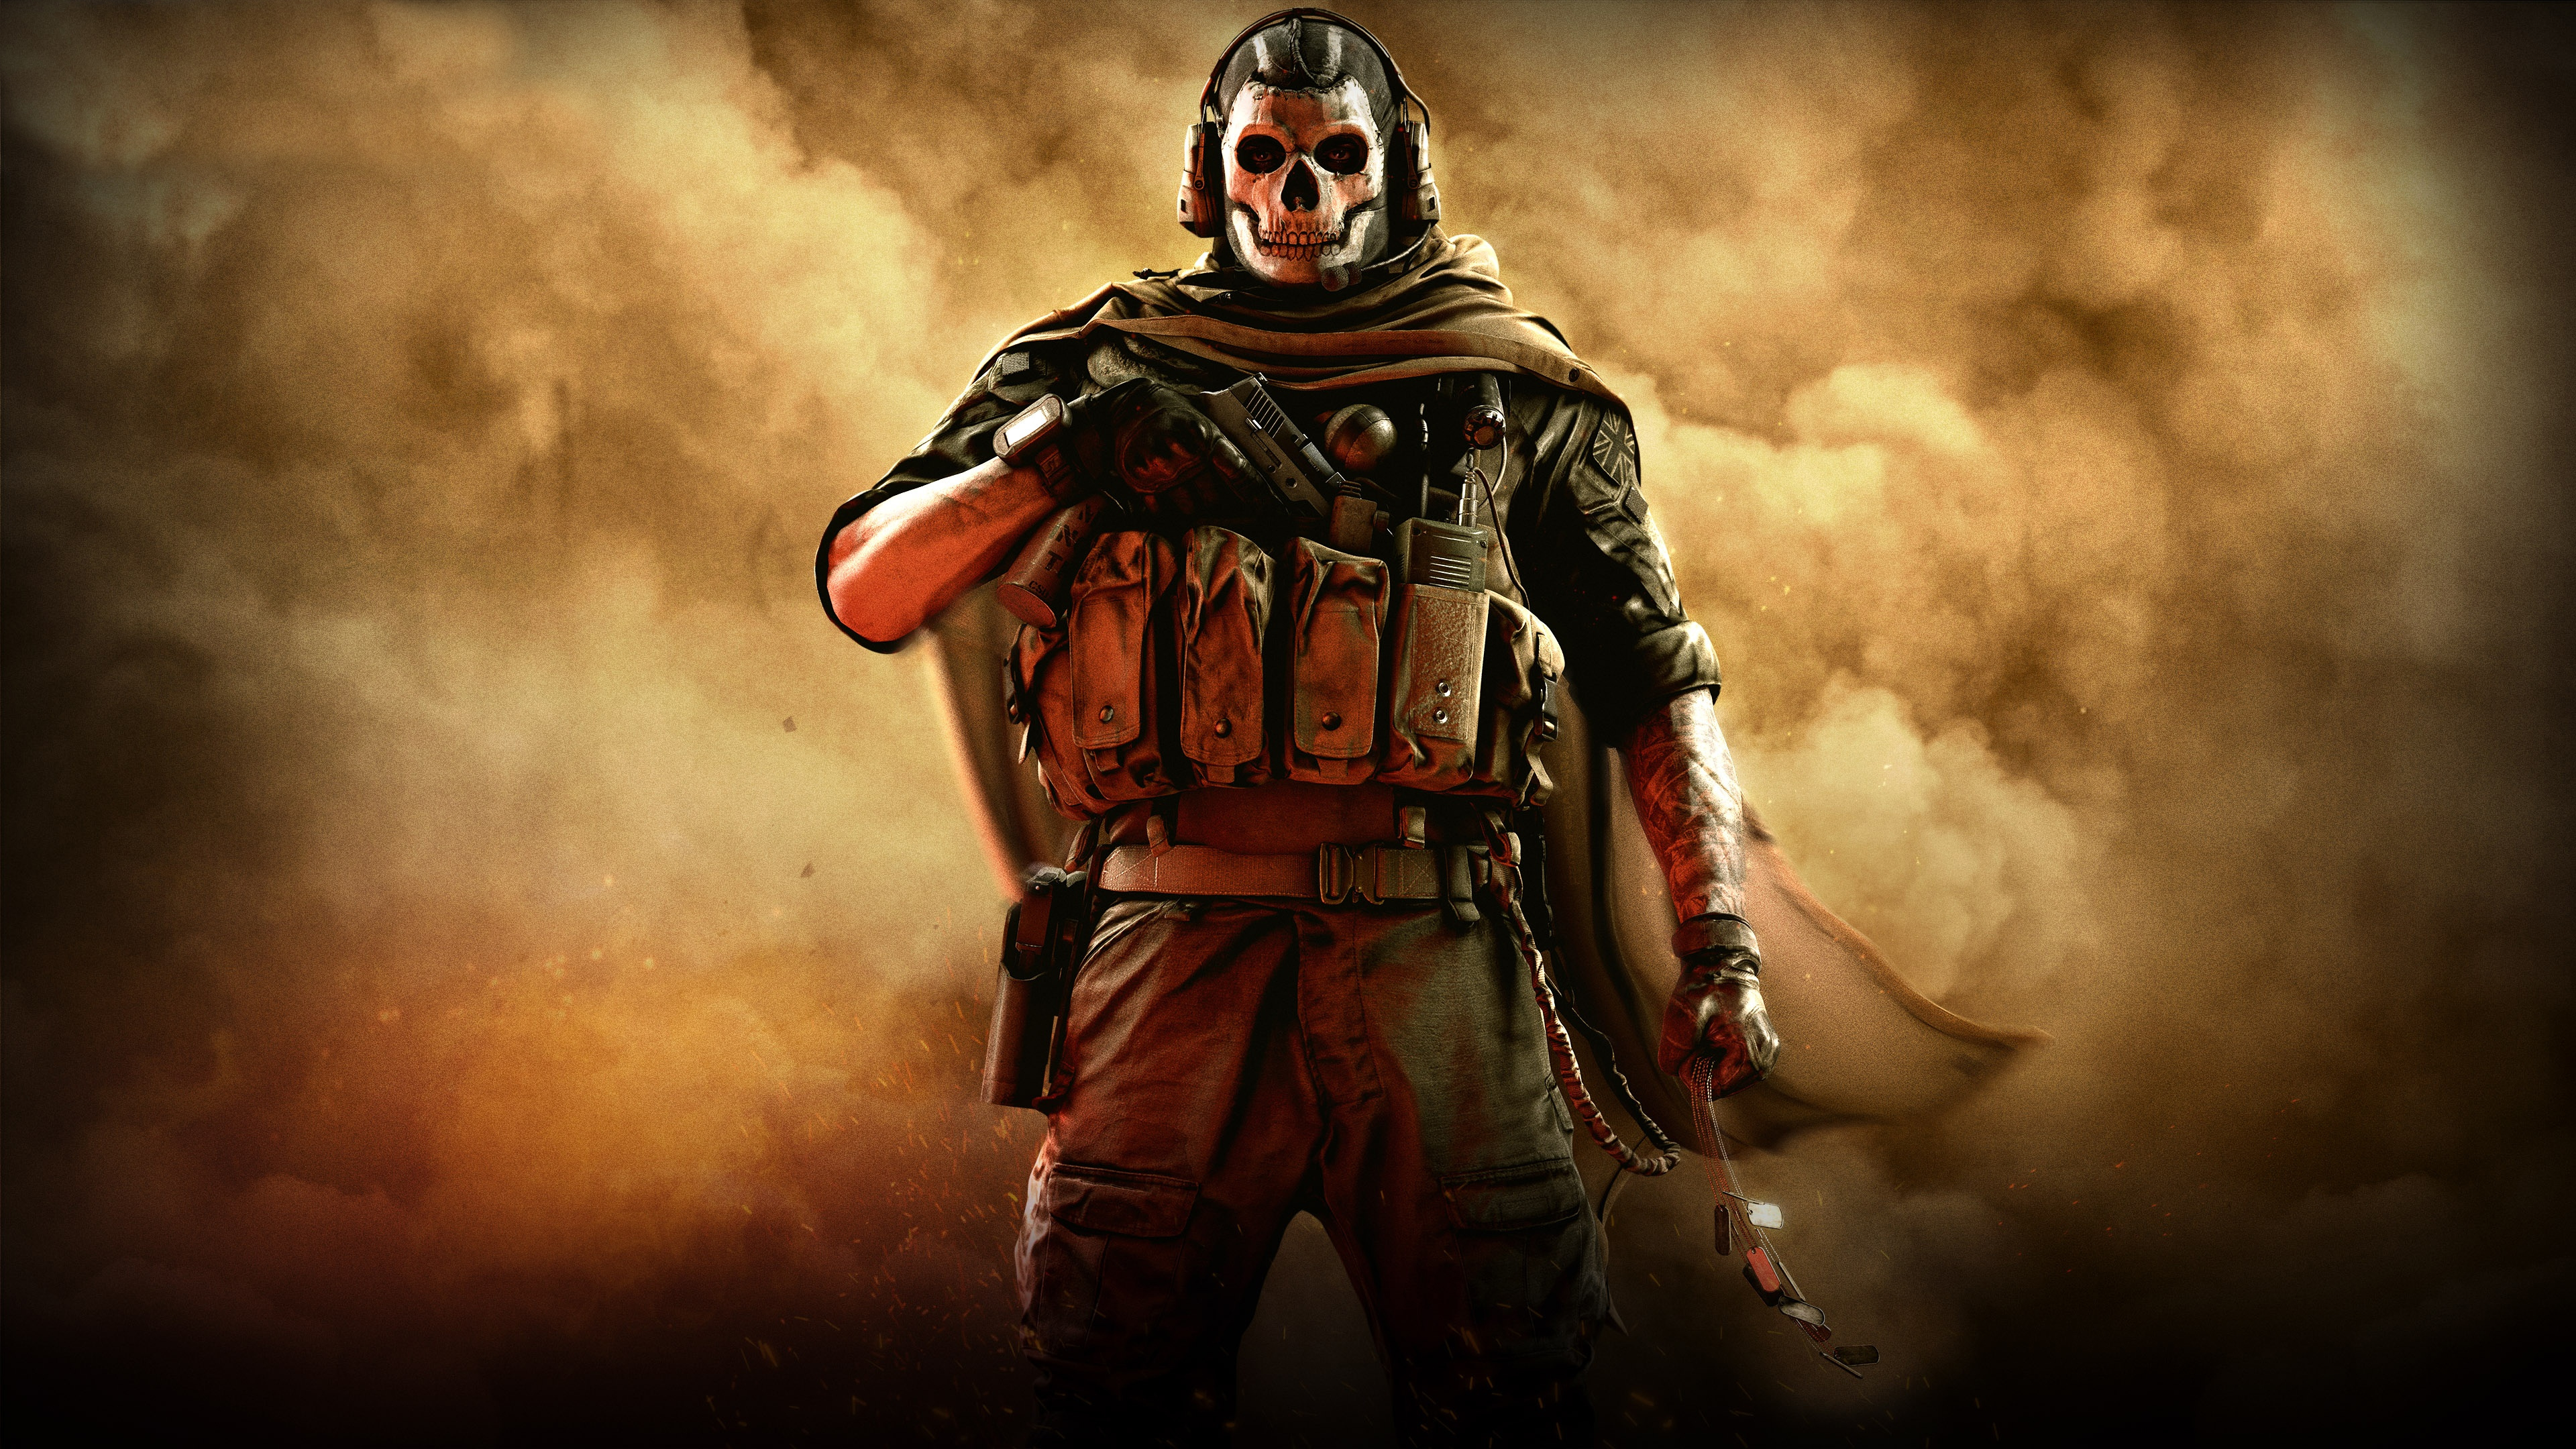 Cod Modern Warfare Poster Wallpaper Hd Games 4k Wallpapers